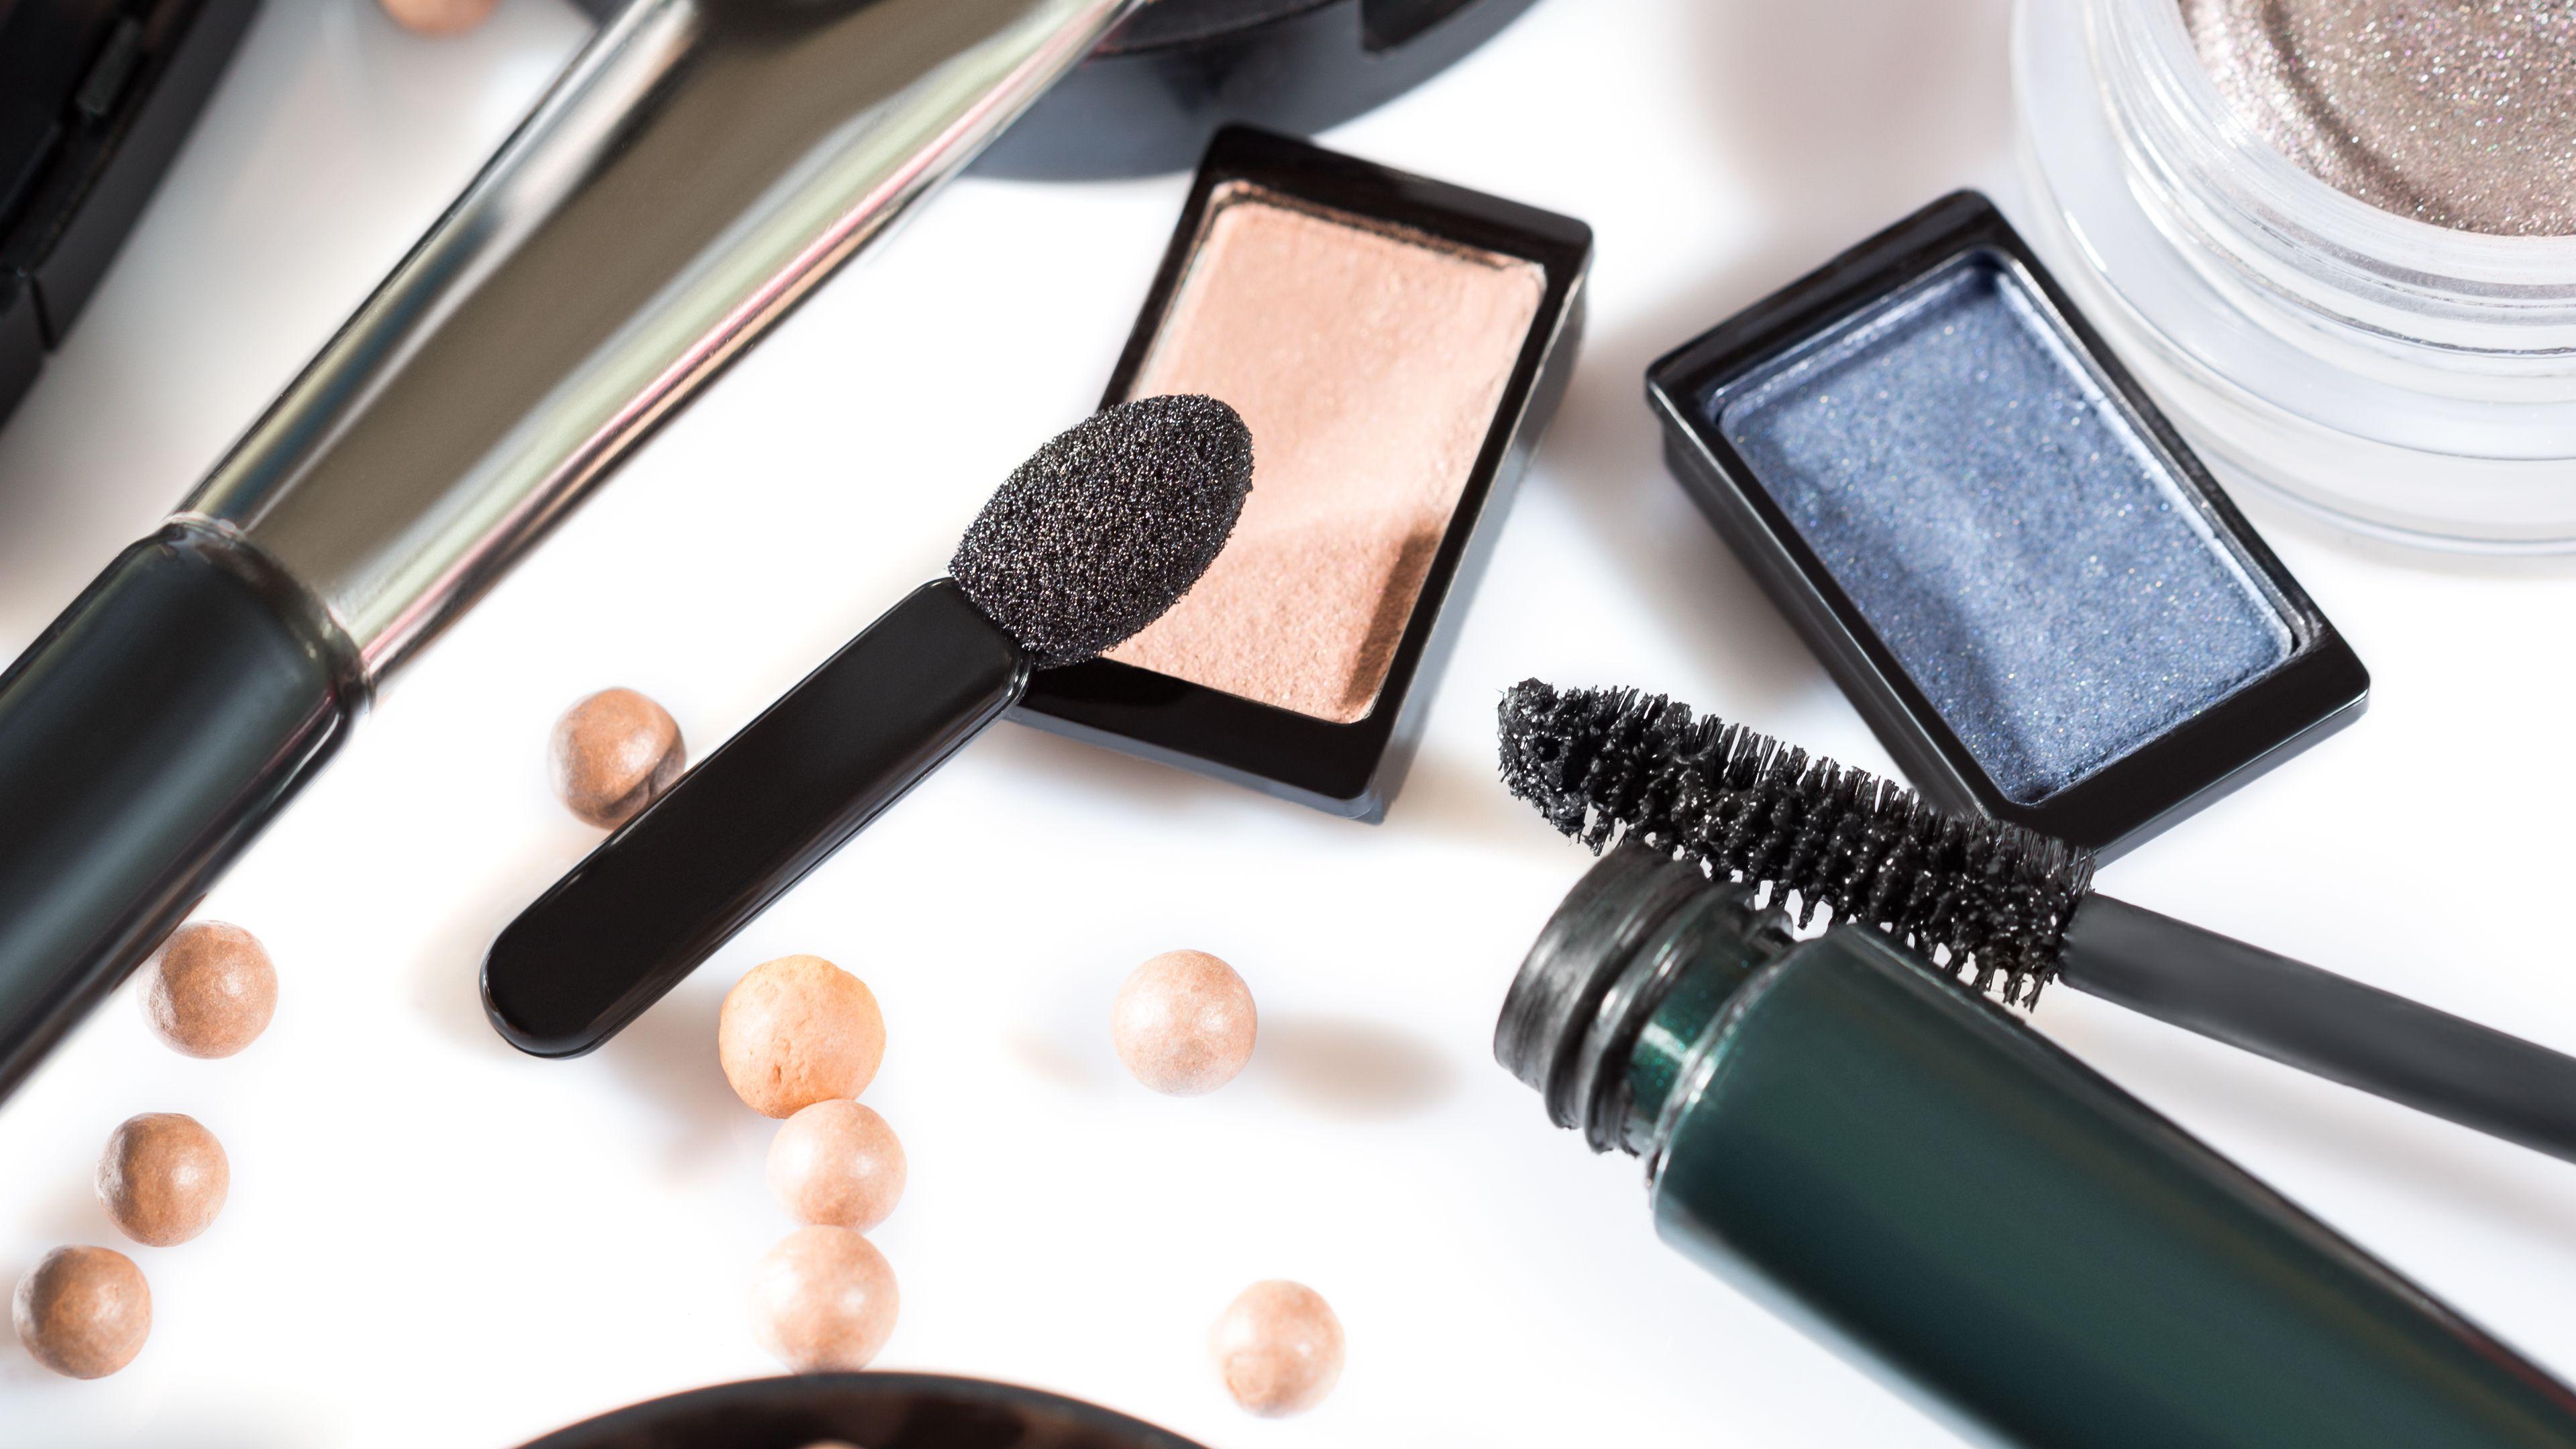 The 7 Best Makeup Websites For